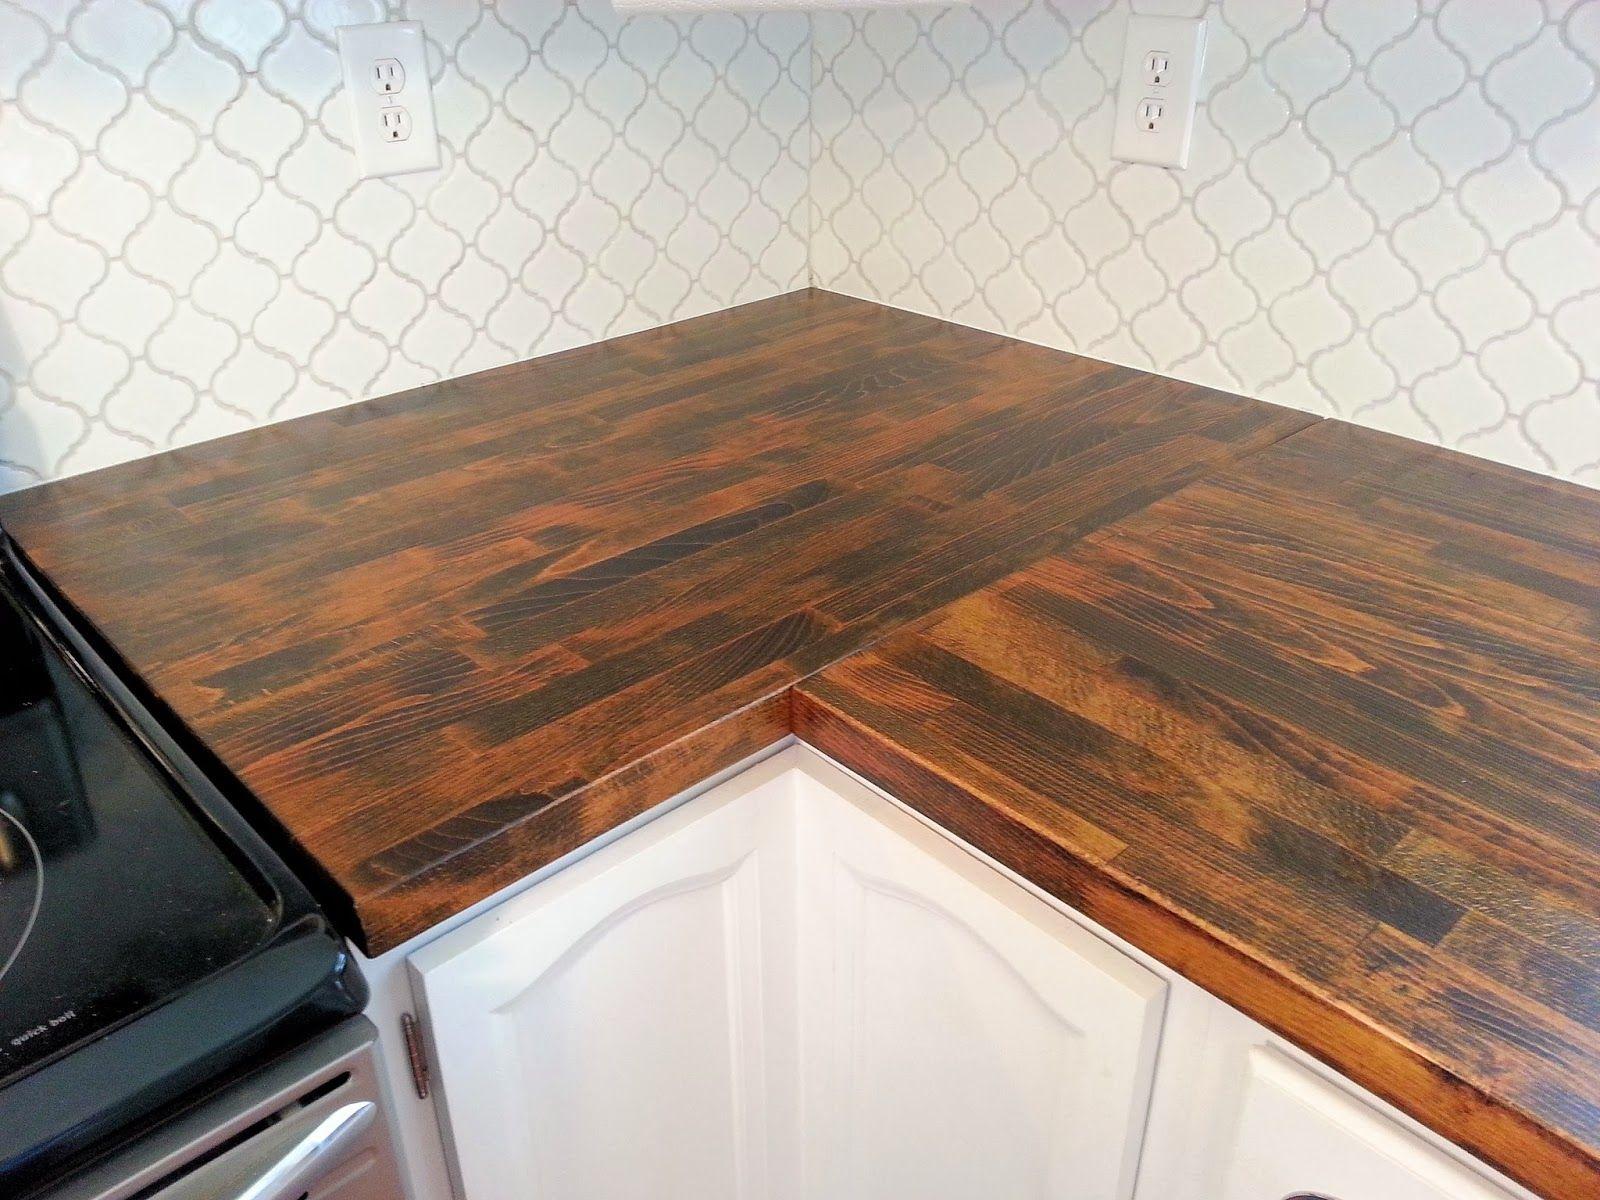 Gorgeous Butcher Block Countertops For Your Kitchen Remodel Tile Backsplash